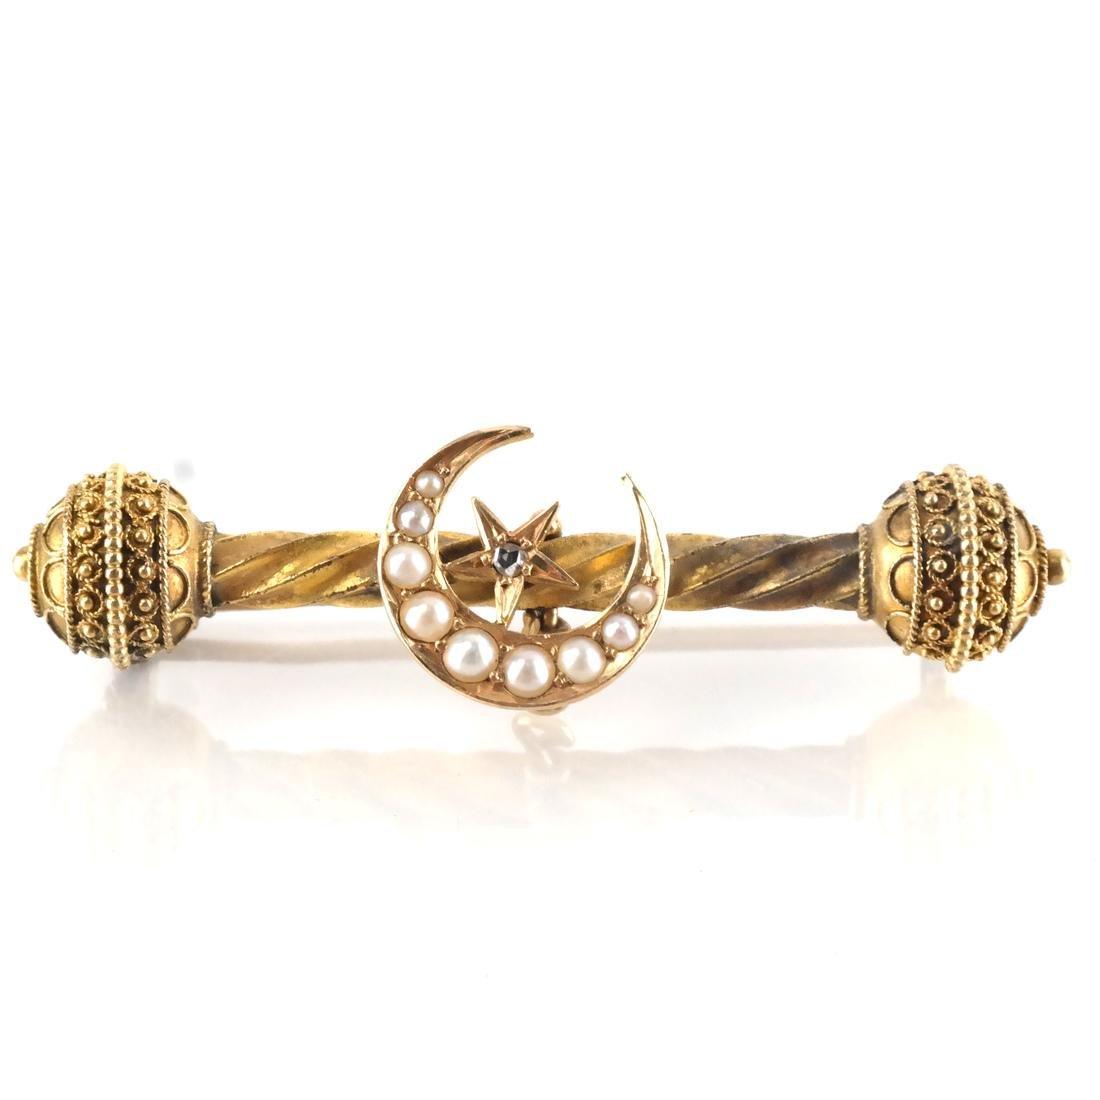 4 Assorted 14k YG Watch Pins, Bar Pins - 2